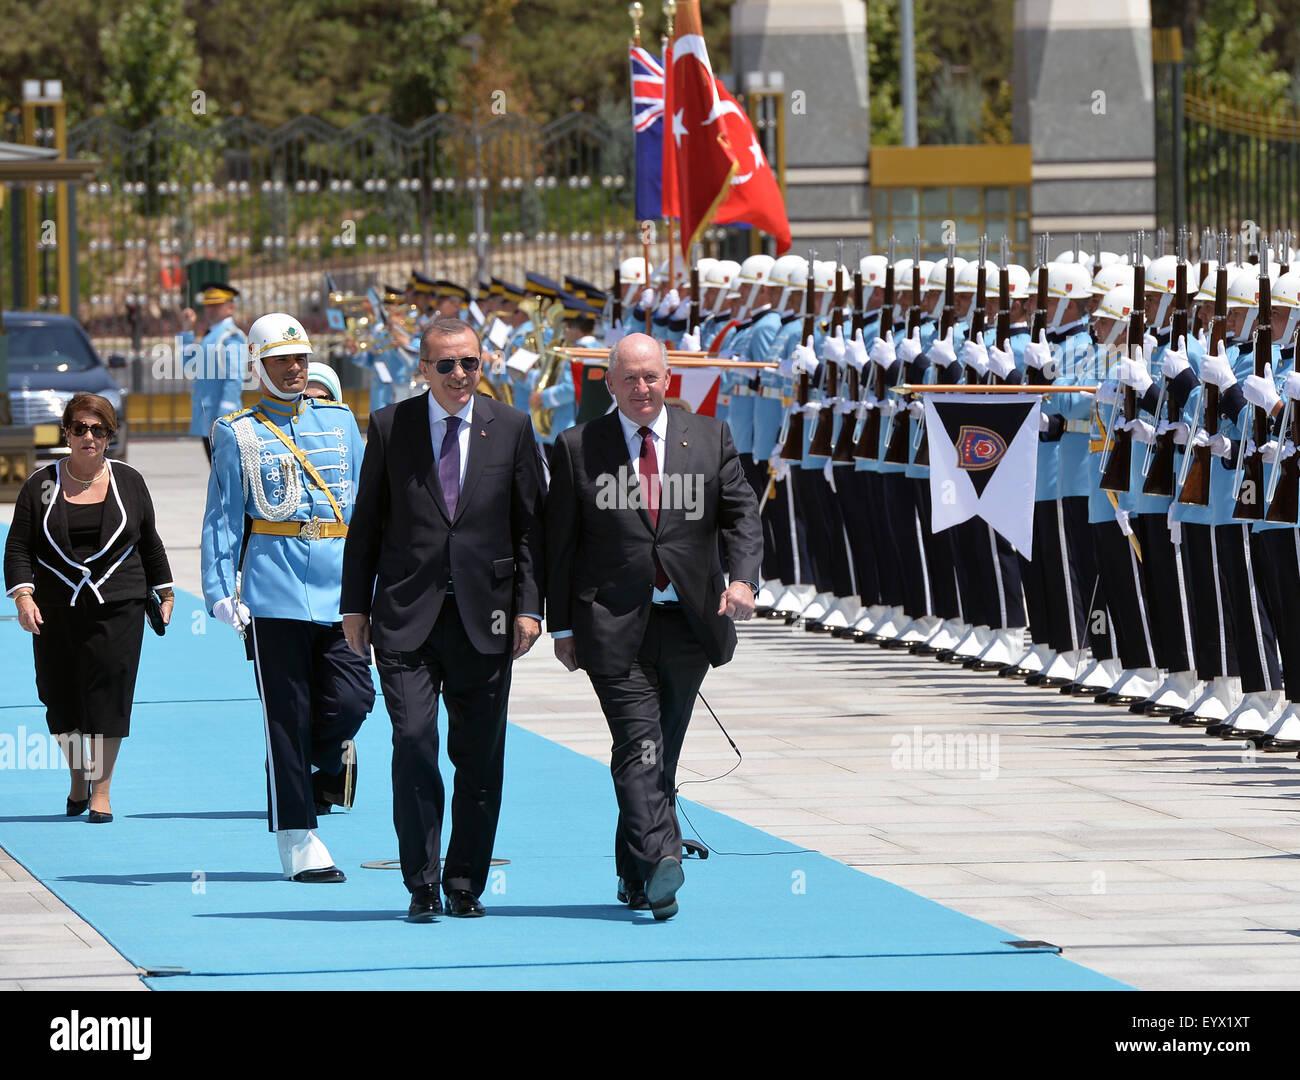 (150804)-- ANKARA, Aug. 4, 2015(Xinhua)-- Turkish President Recep Tayyip Erdogan (L, front) accompanies Governor - Stock Image